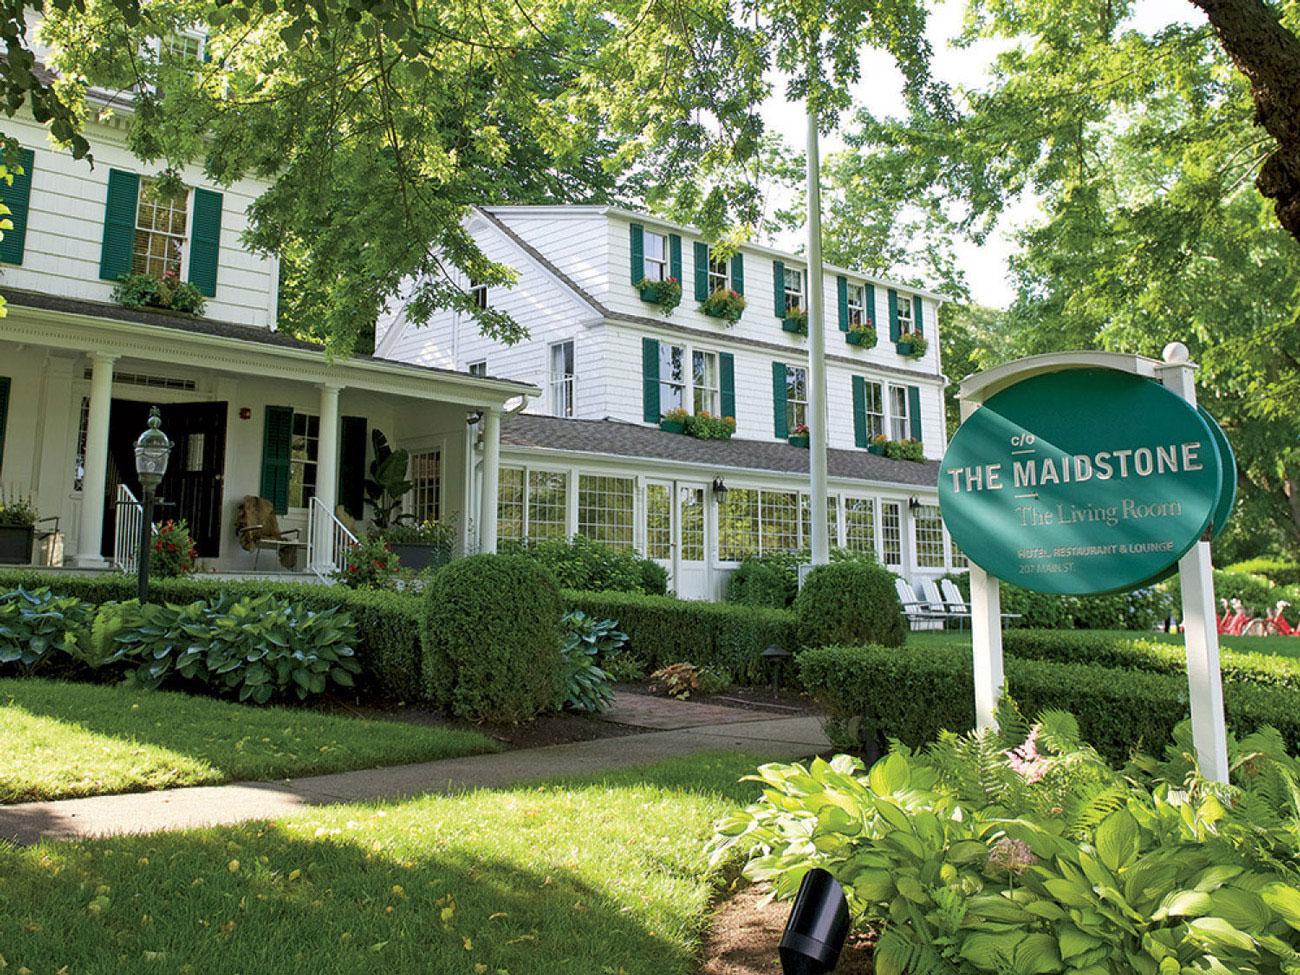 The Maidstone Hotel